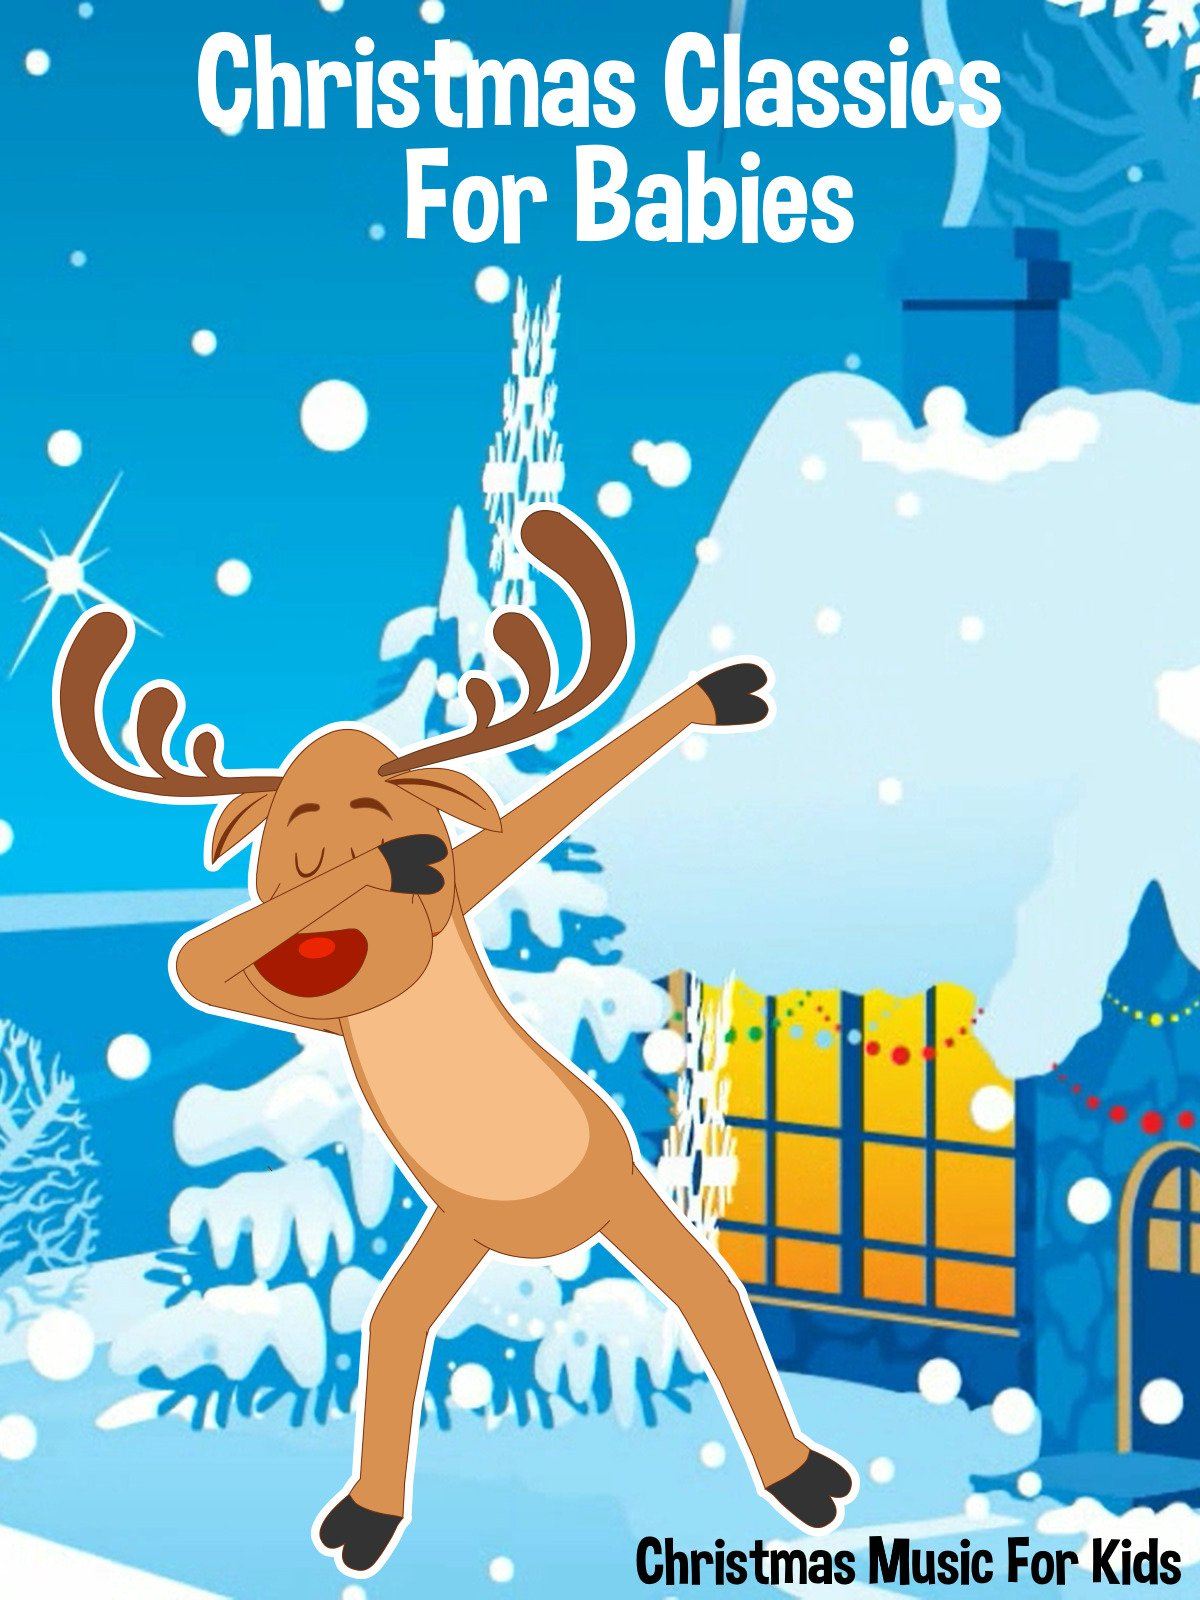 Christmas Classics For Babies